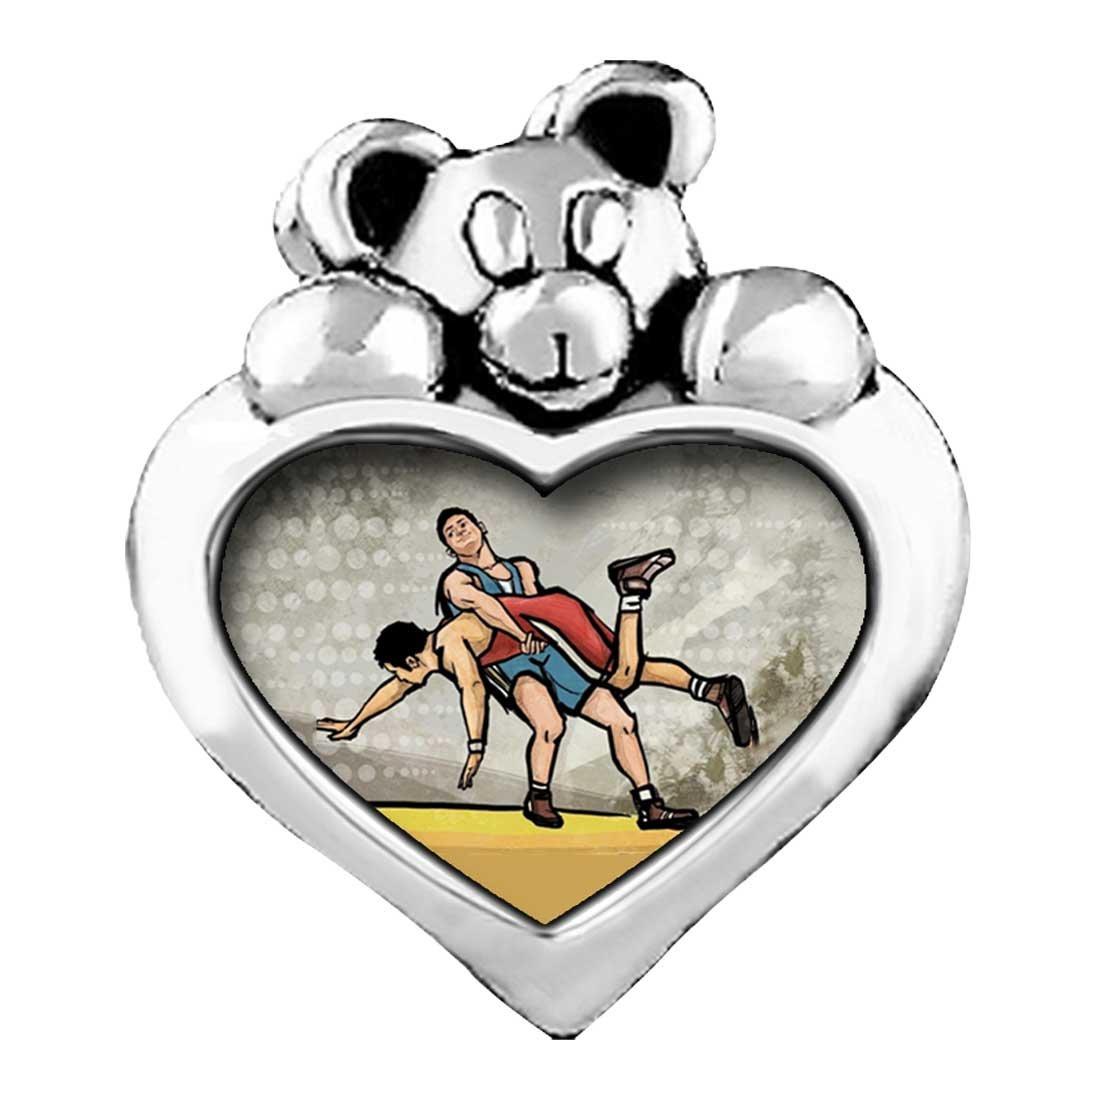 Olympics Wrestling Red Siam Crystal January Birthstone I Love You Heart Care Bear Charm Bracelets